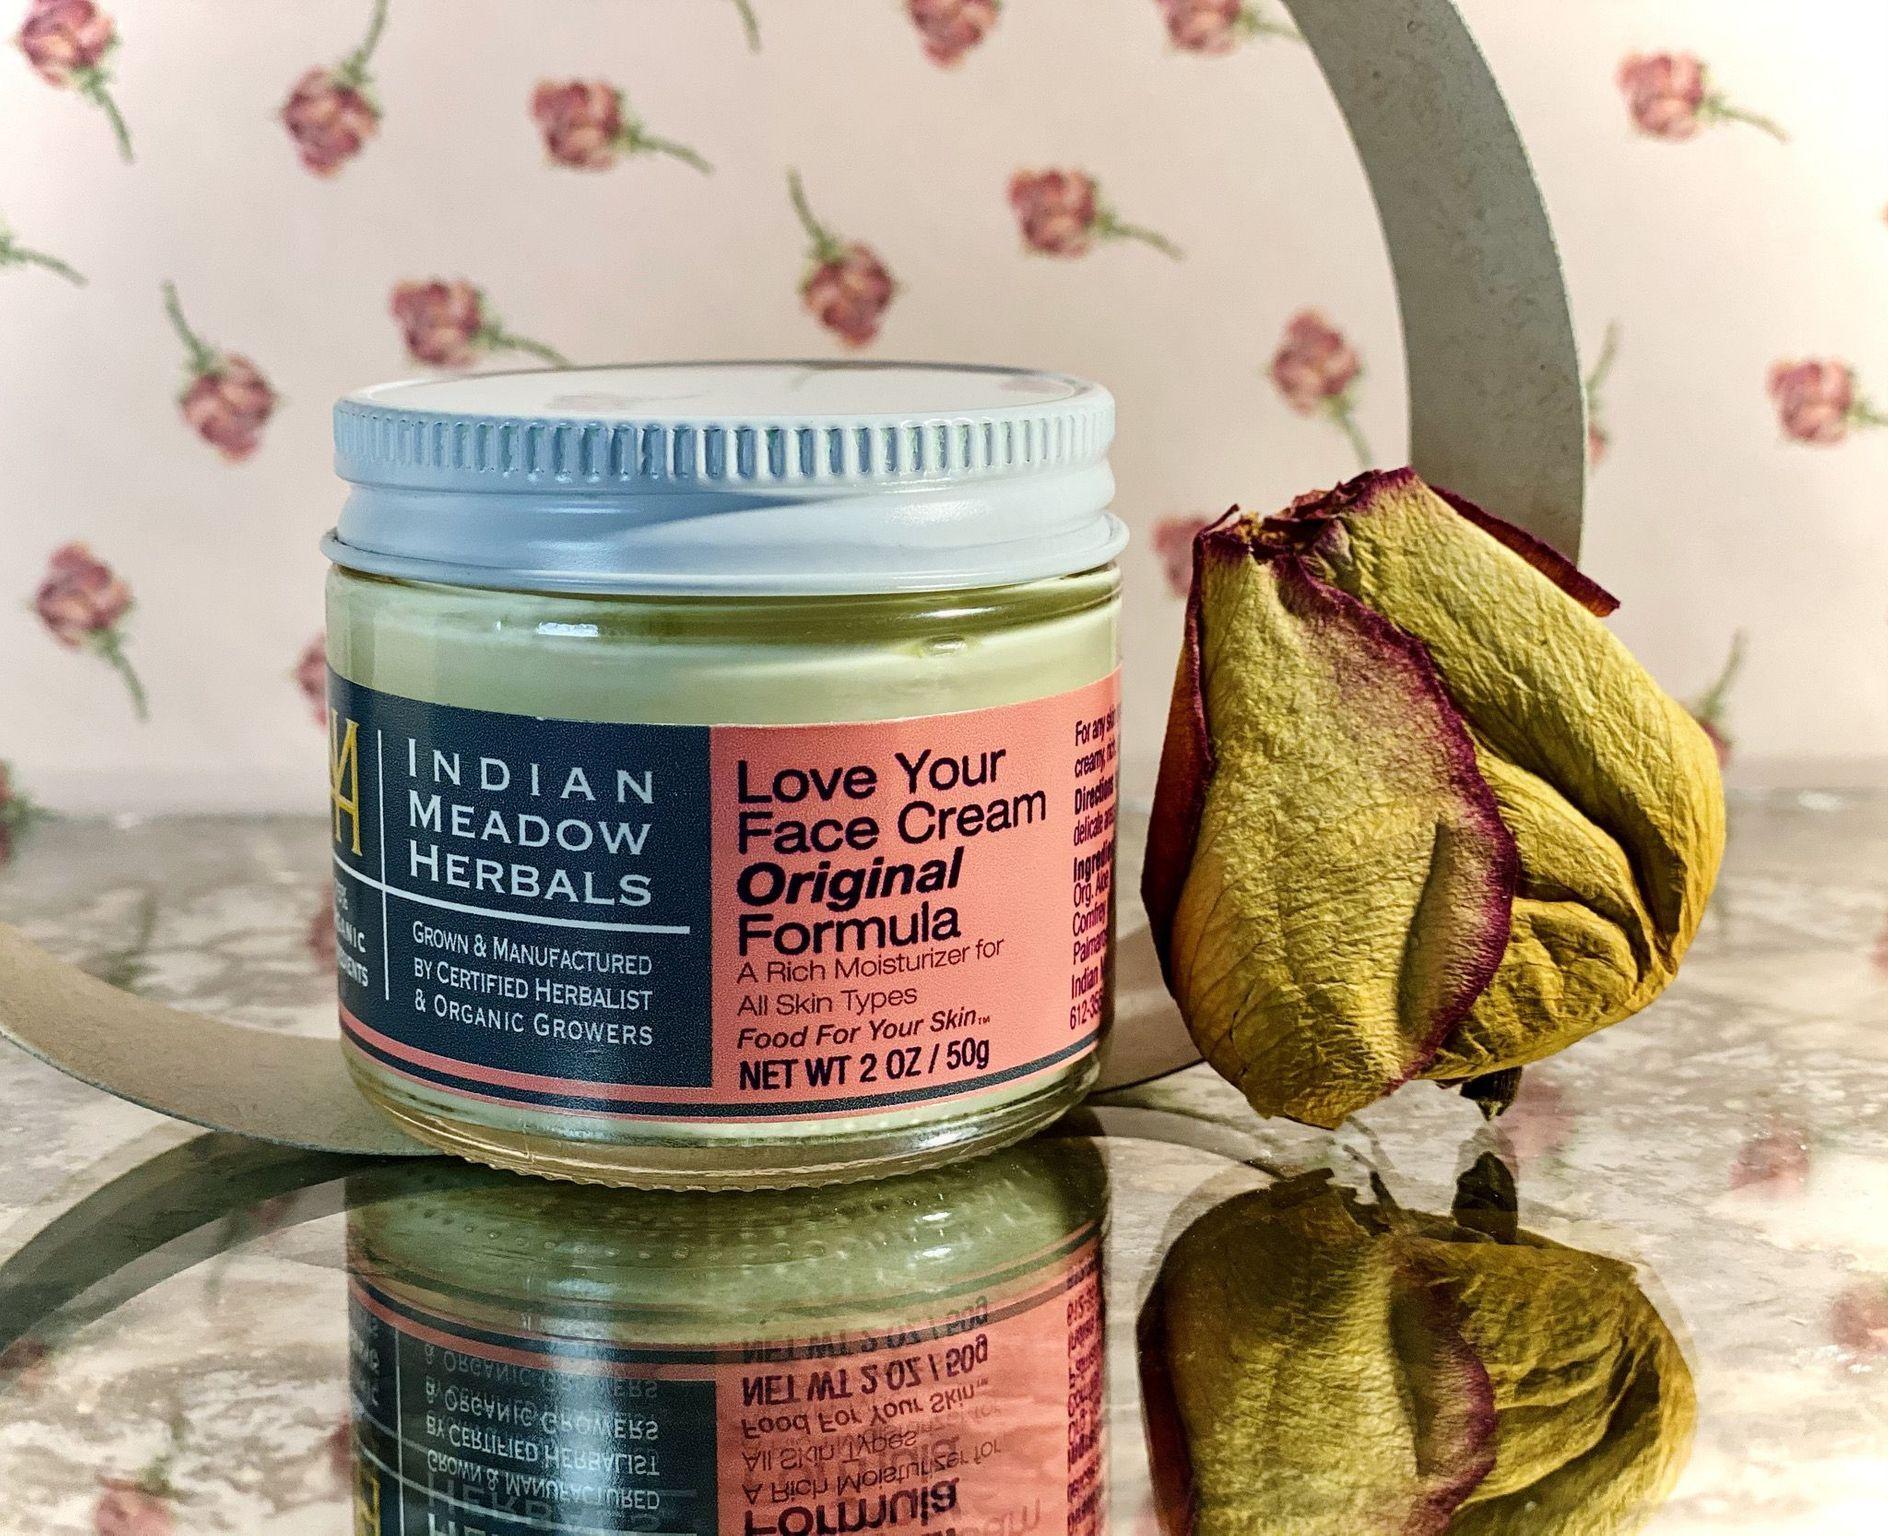 Love Your Face Cream - original formula